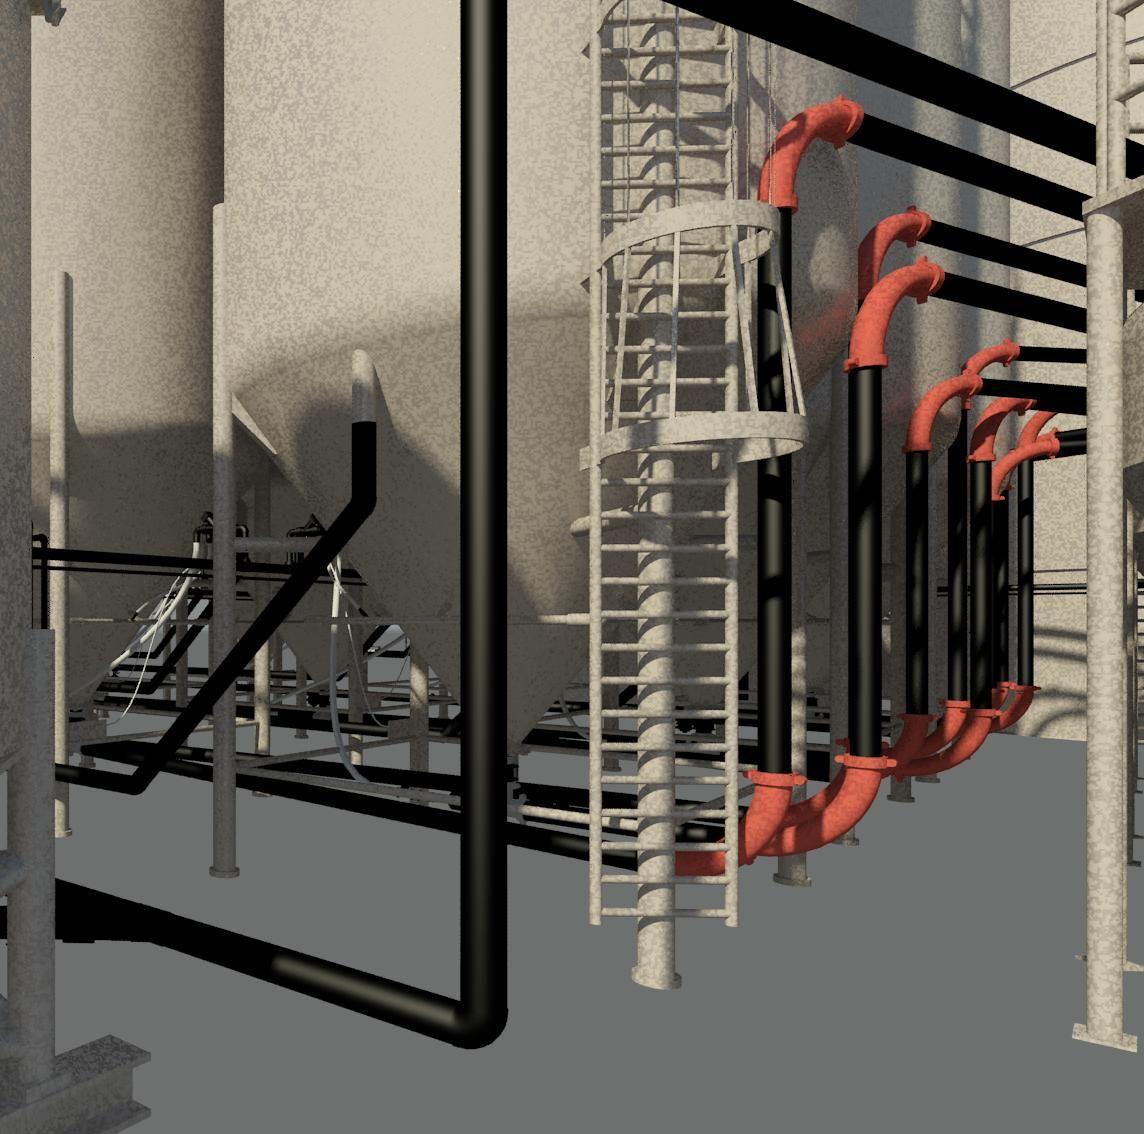 Revit mep bim model design building information modeling for Architecture firms that use revit